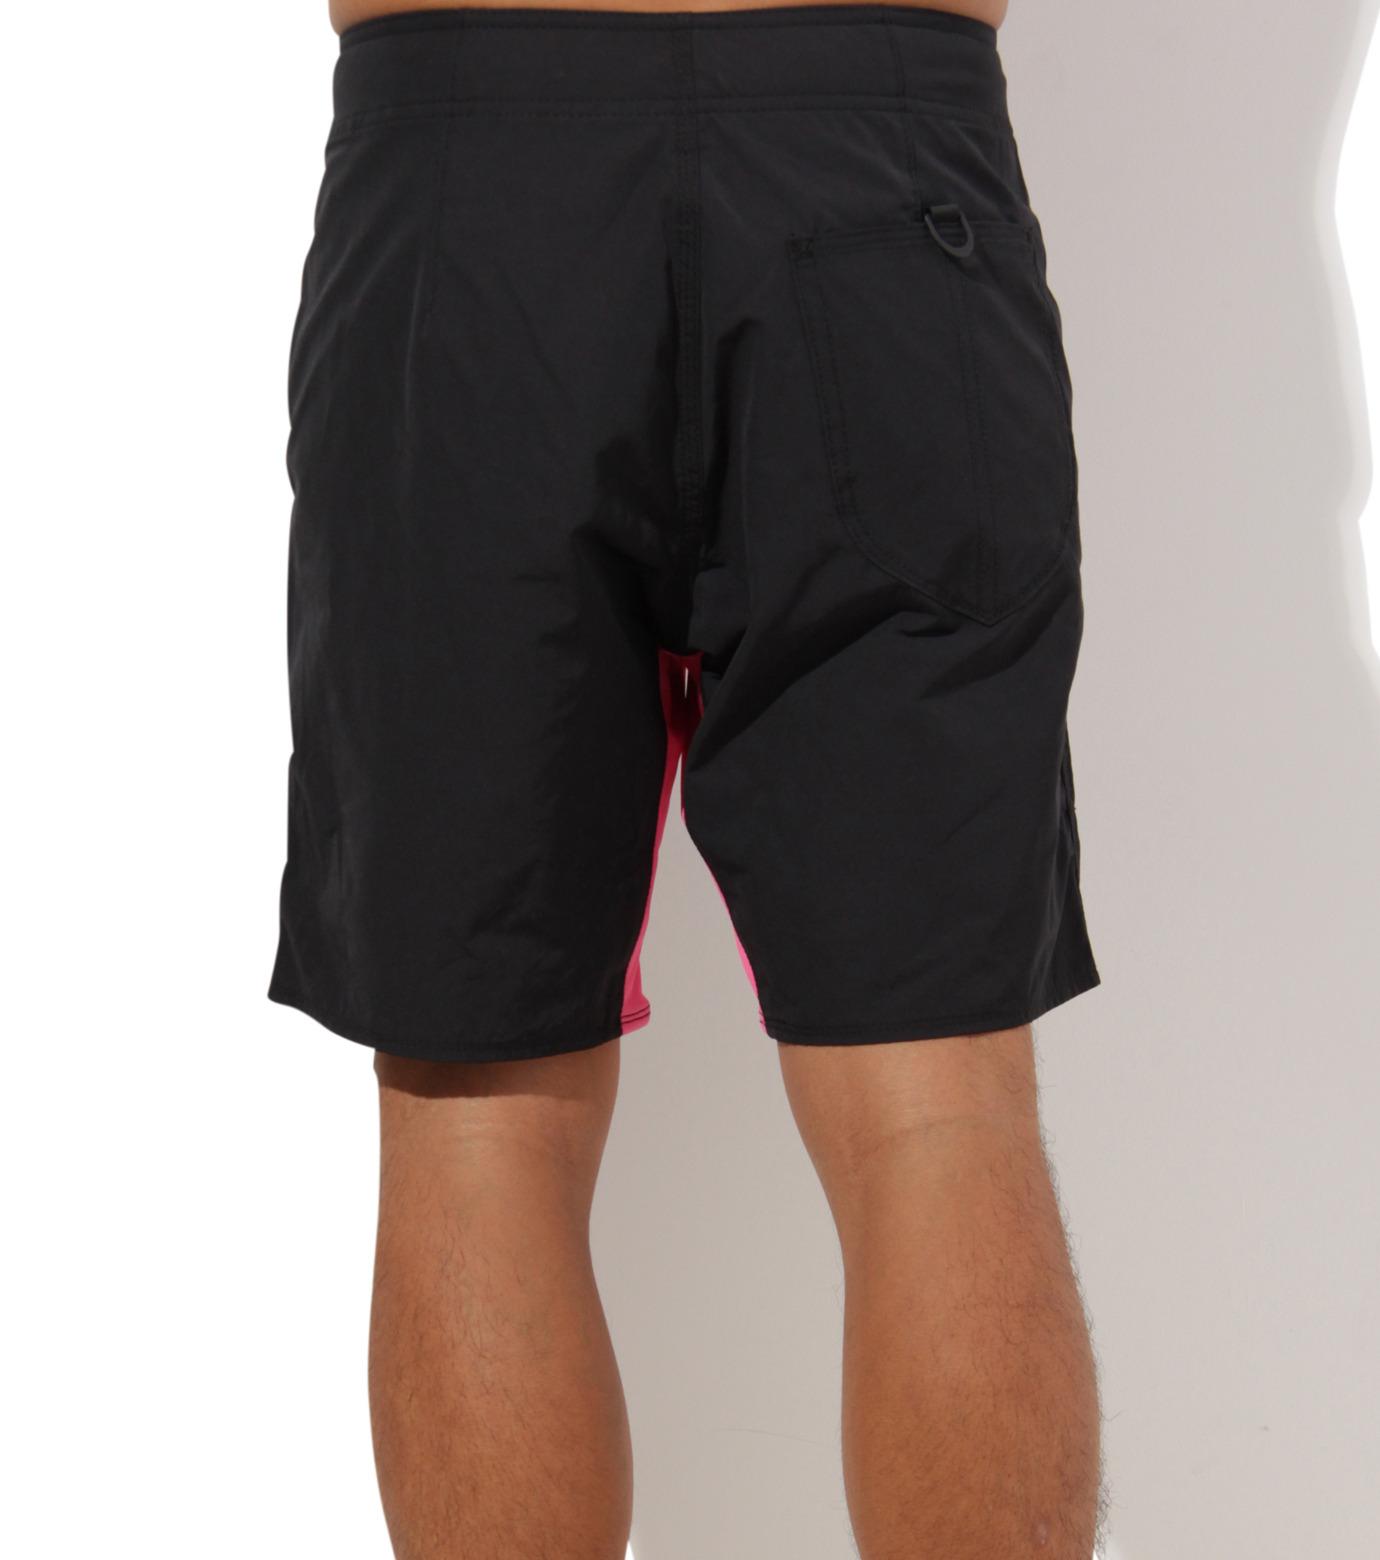 TWO TWO ONE(トゥートゥーワン)のSurf shorts short-PINK(SWIMWEAR/SWIMWEAR)-15N948001-72 拡大詳細画像4